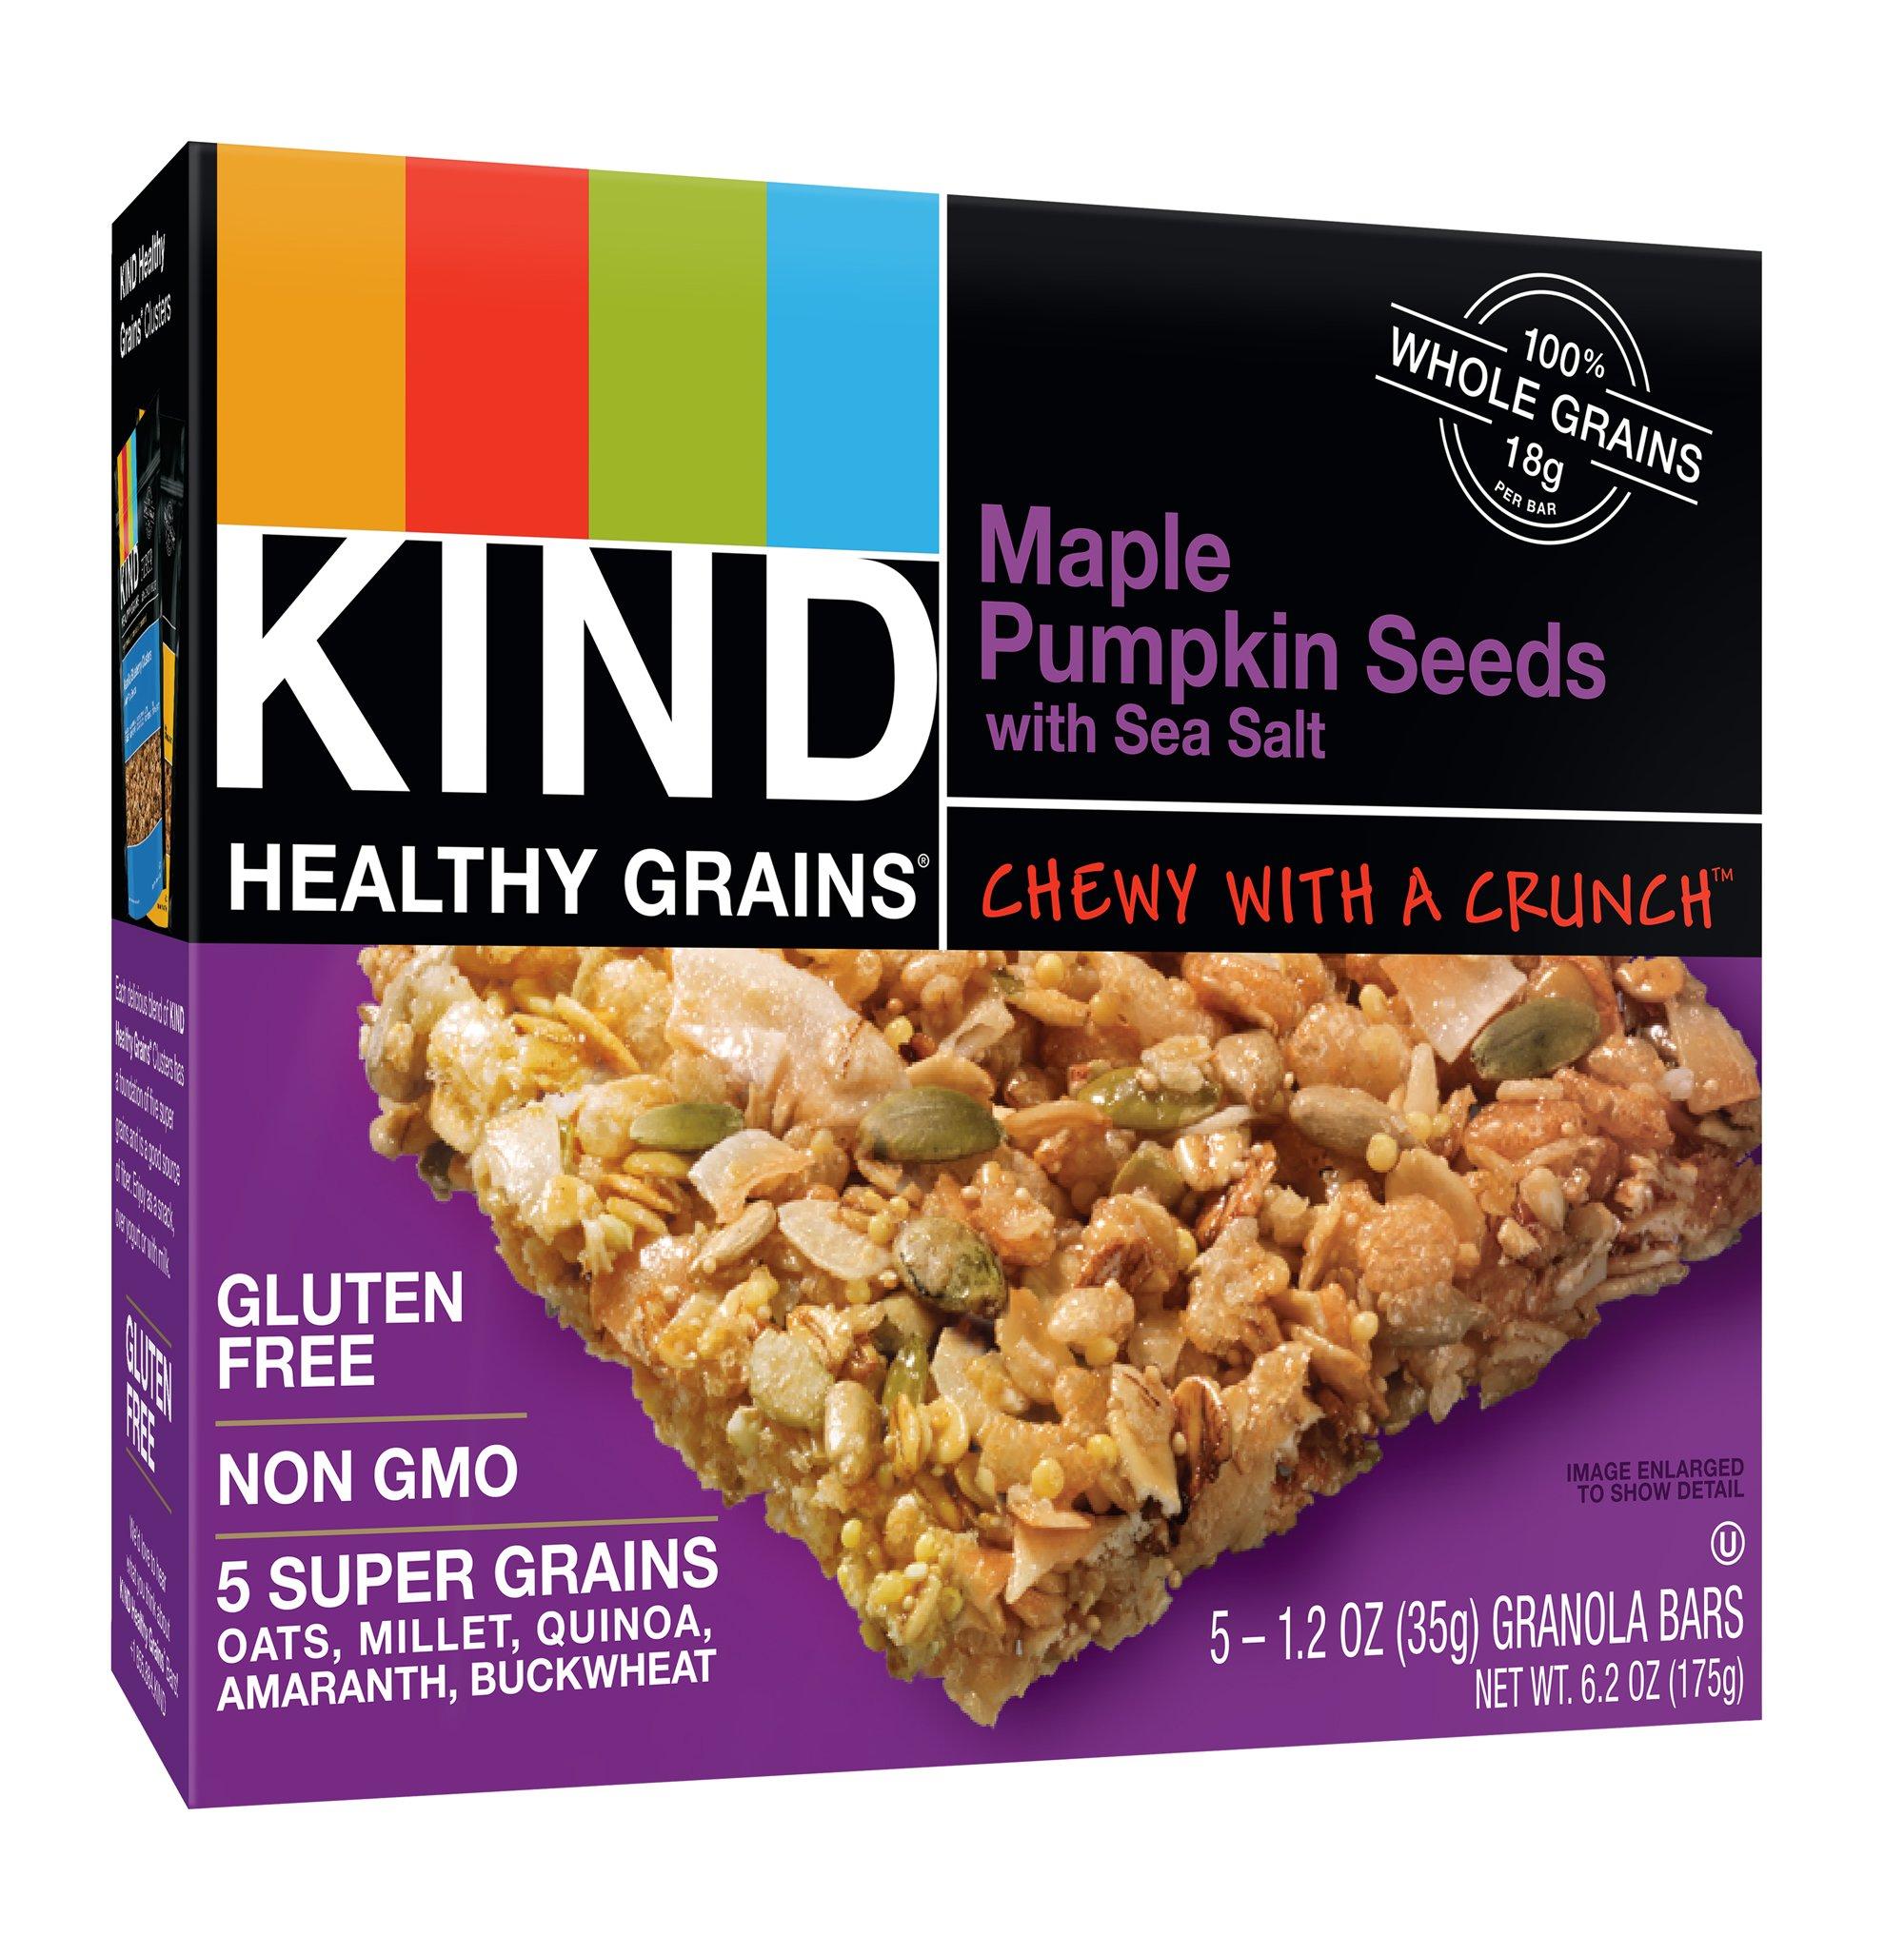 KIND Healthy Grains Bars, Maple Pumpkin Seeds with Sea Salt, Non GMO, Gluten Free, 1.2oz, 30 Count